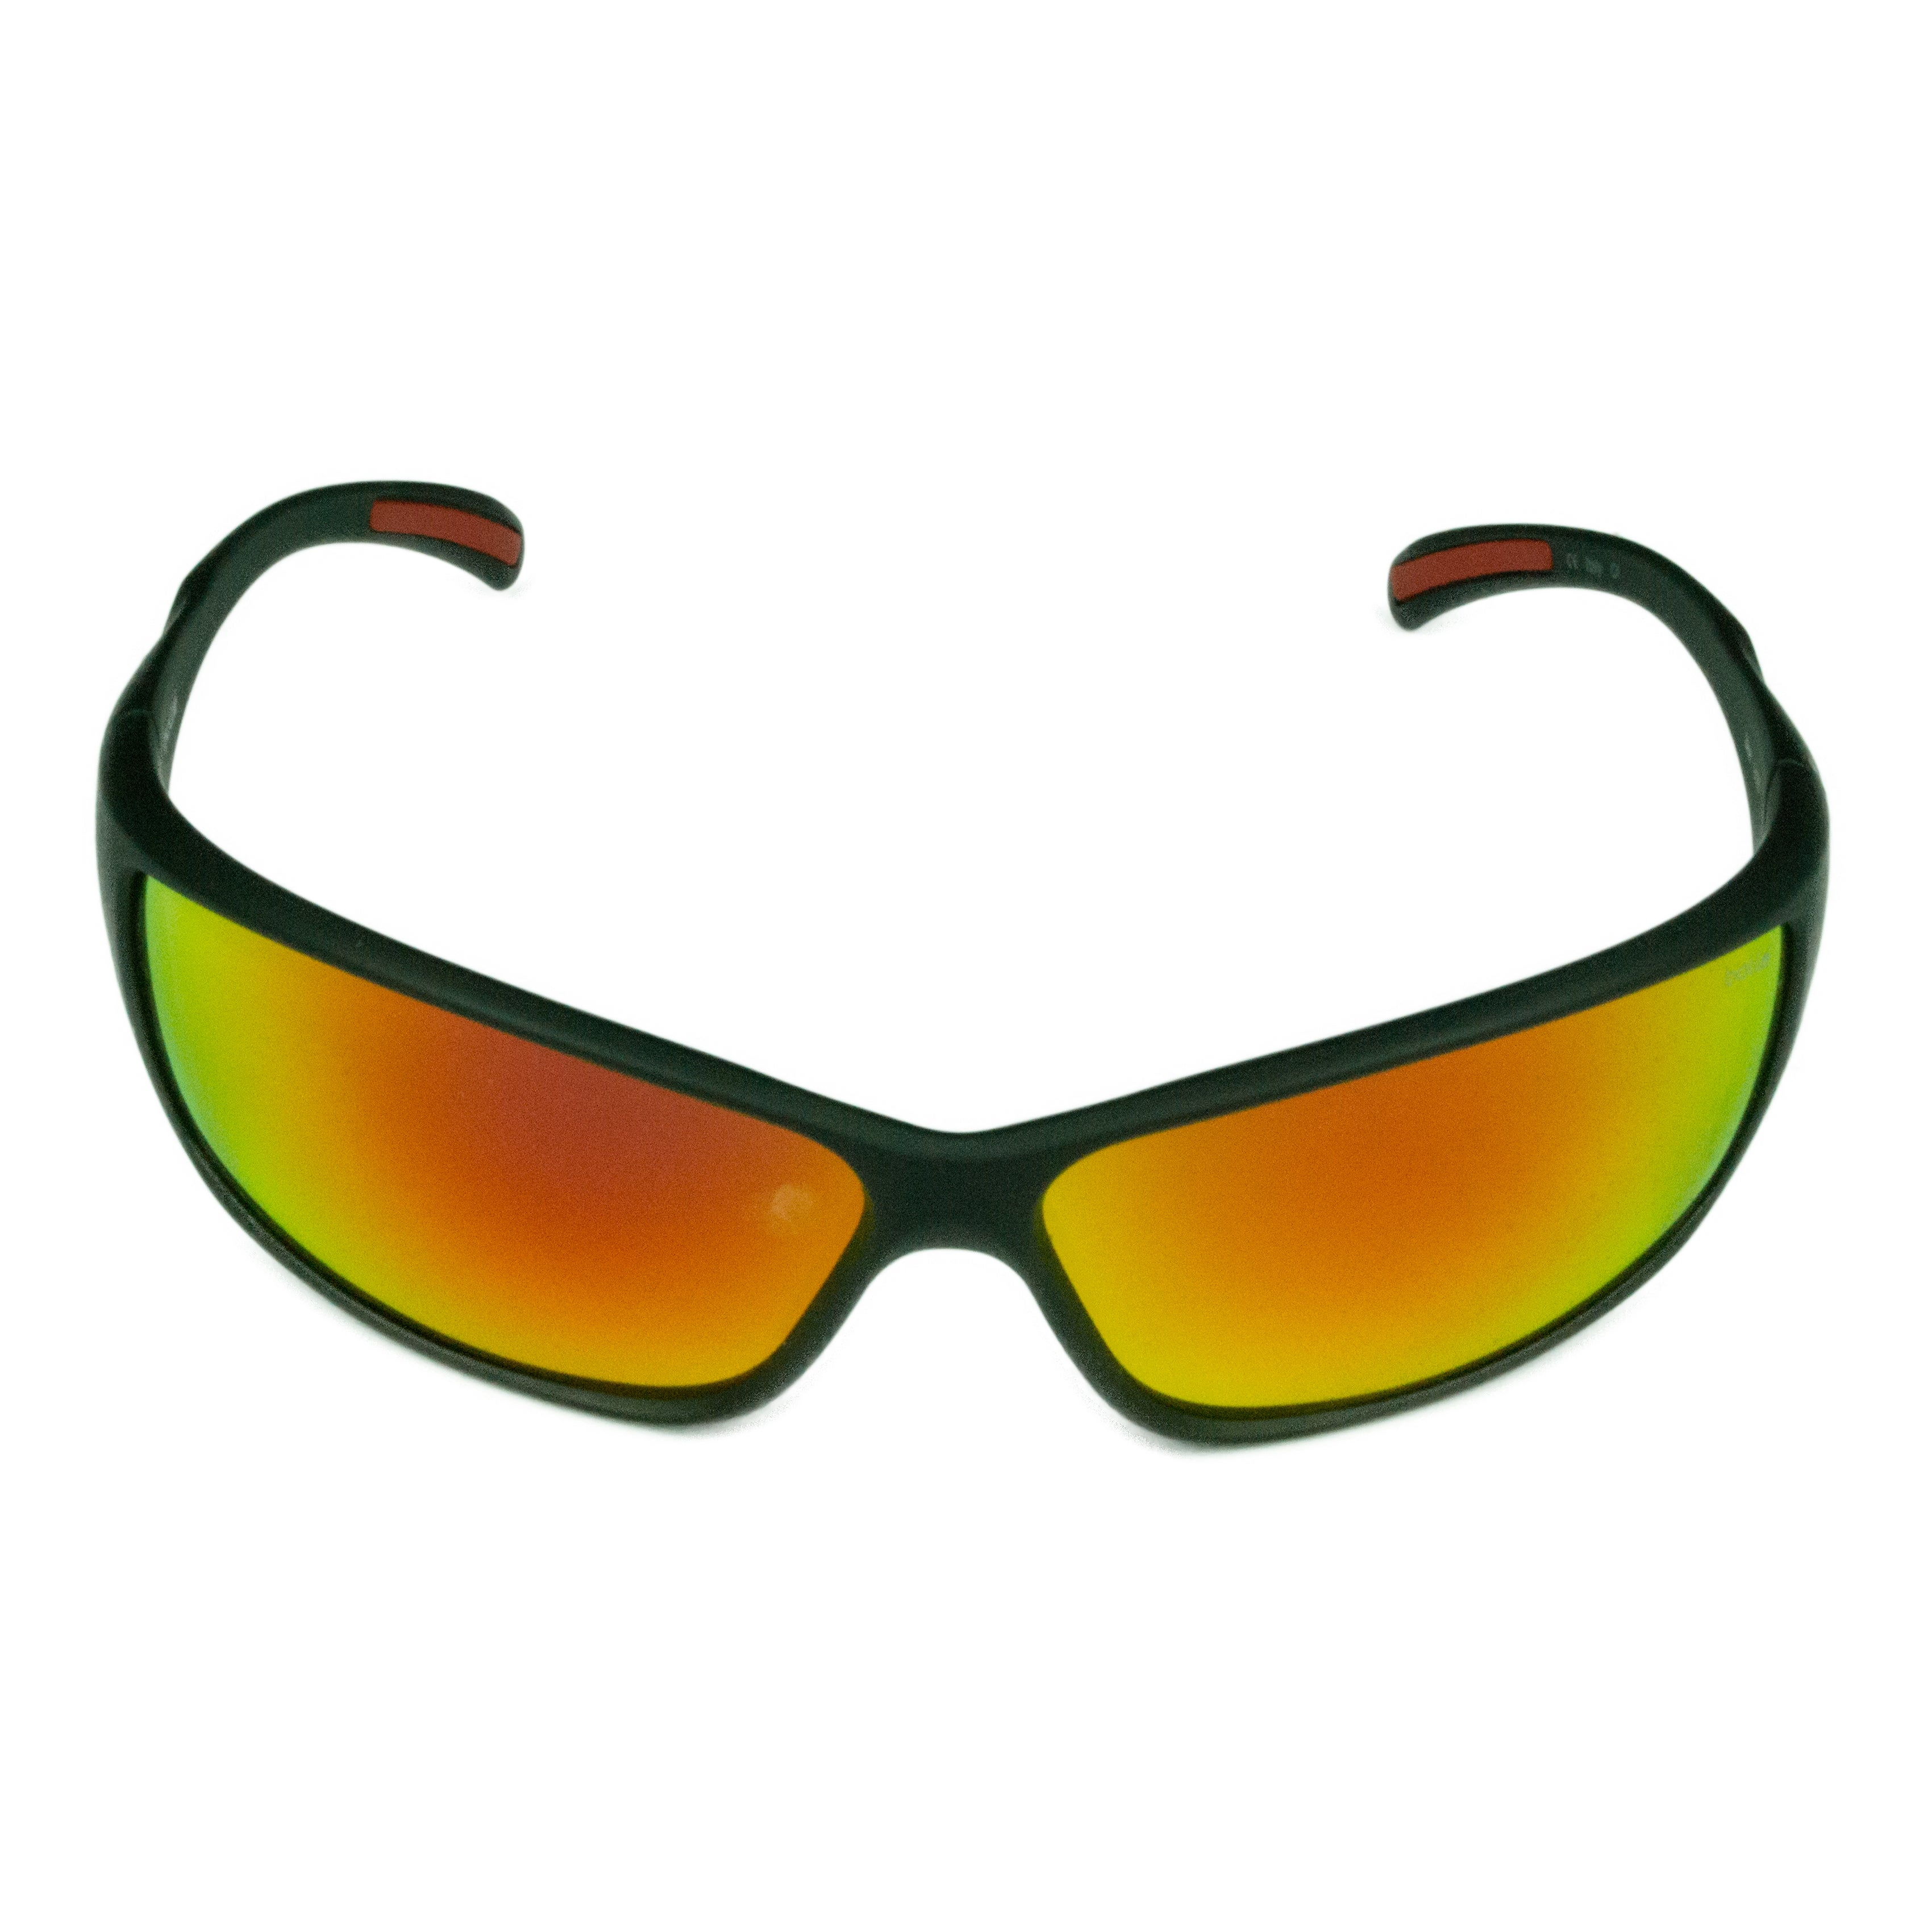 c1896ec223 Shop Bolle Sport Mens Slice 12129 Matte Black w  TNS Fire Lens Sunglasses - Free  Shipping Today - Overstock - 18228909